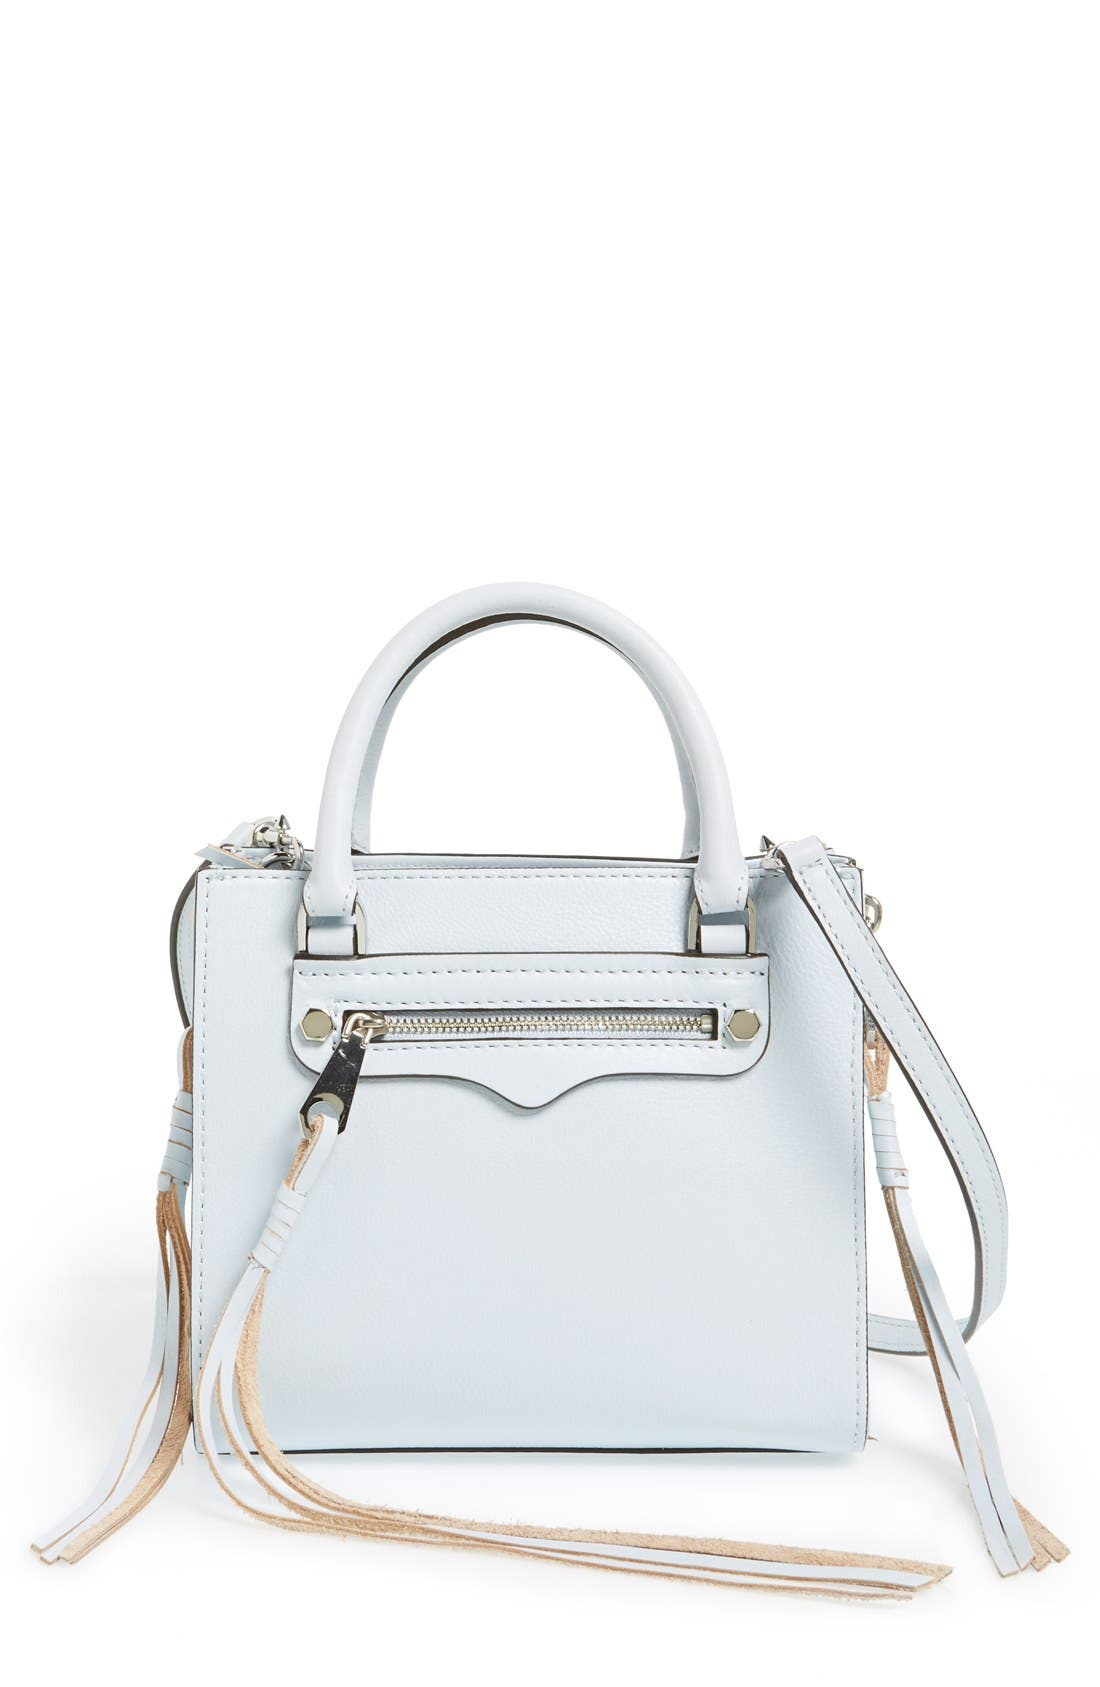 Main Image - Rebecca Minkoff 'Side Zip Mini Regan' Crossbody Bag (Nordstrom Exclusive)